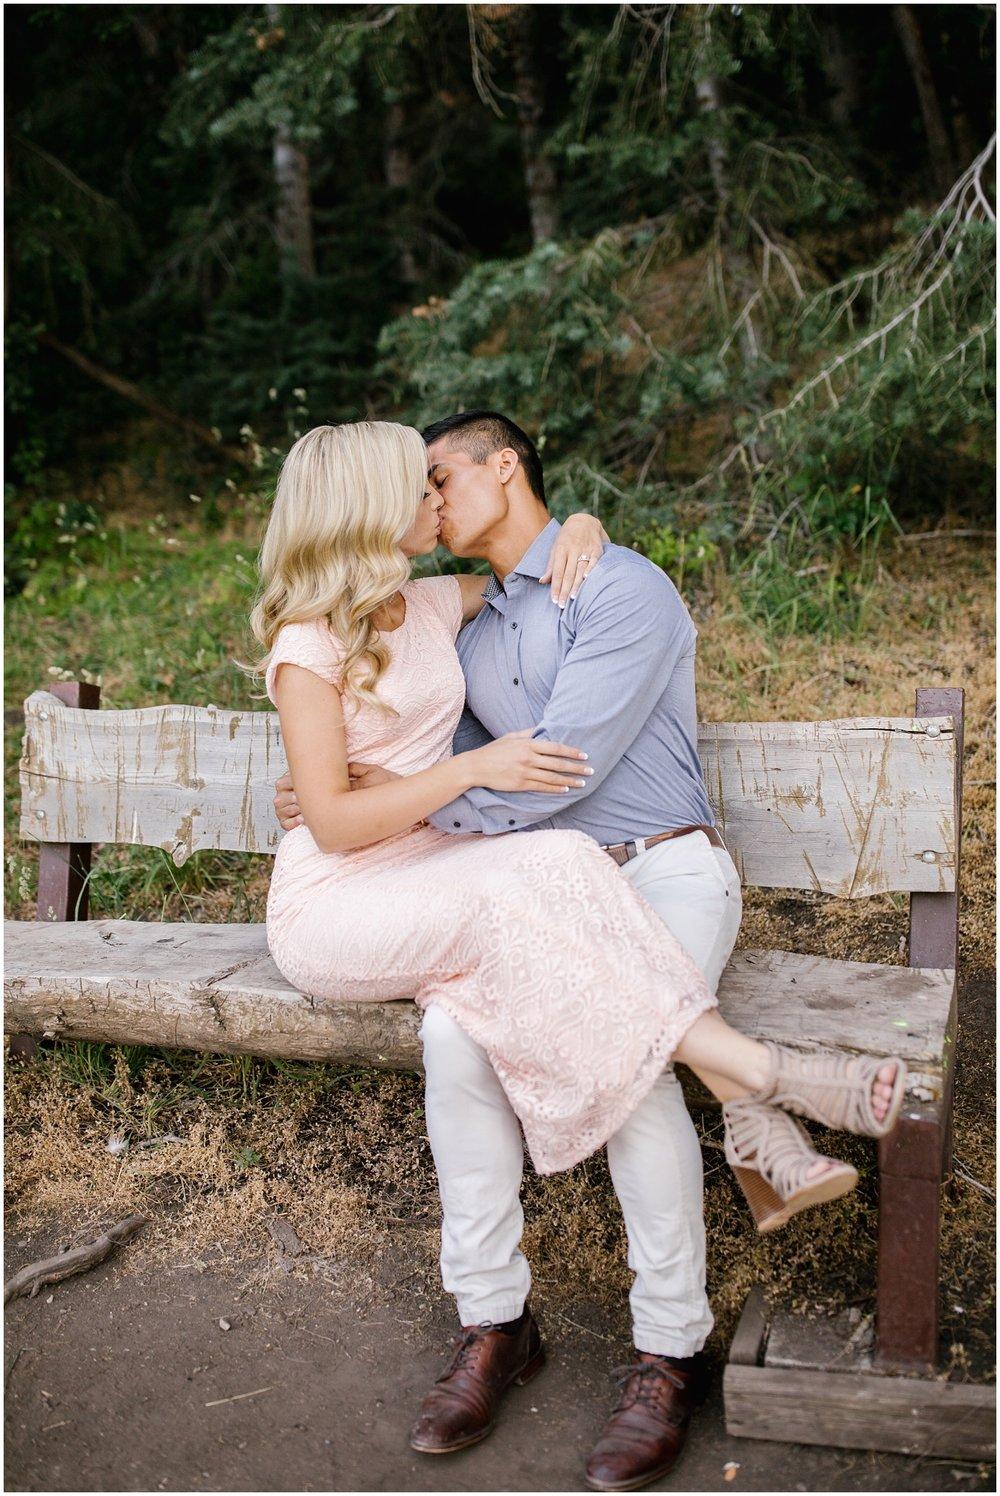 HCengagements-119_Lizzie-B-Imagery-Utah-Wedding-Photographer-Park-City-Salt-Lake-City-Payson-Canyon-Engagement-Session.jpg